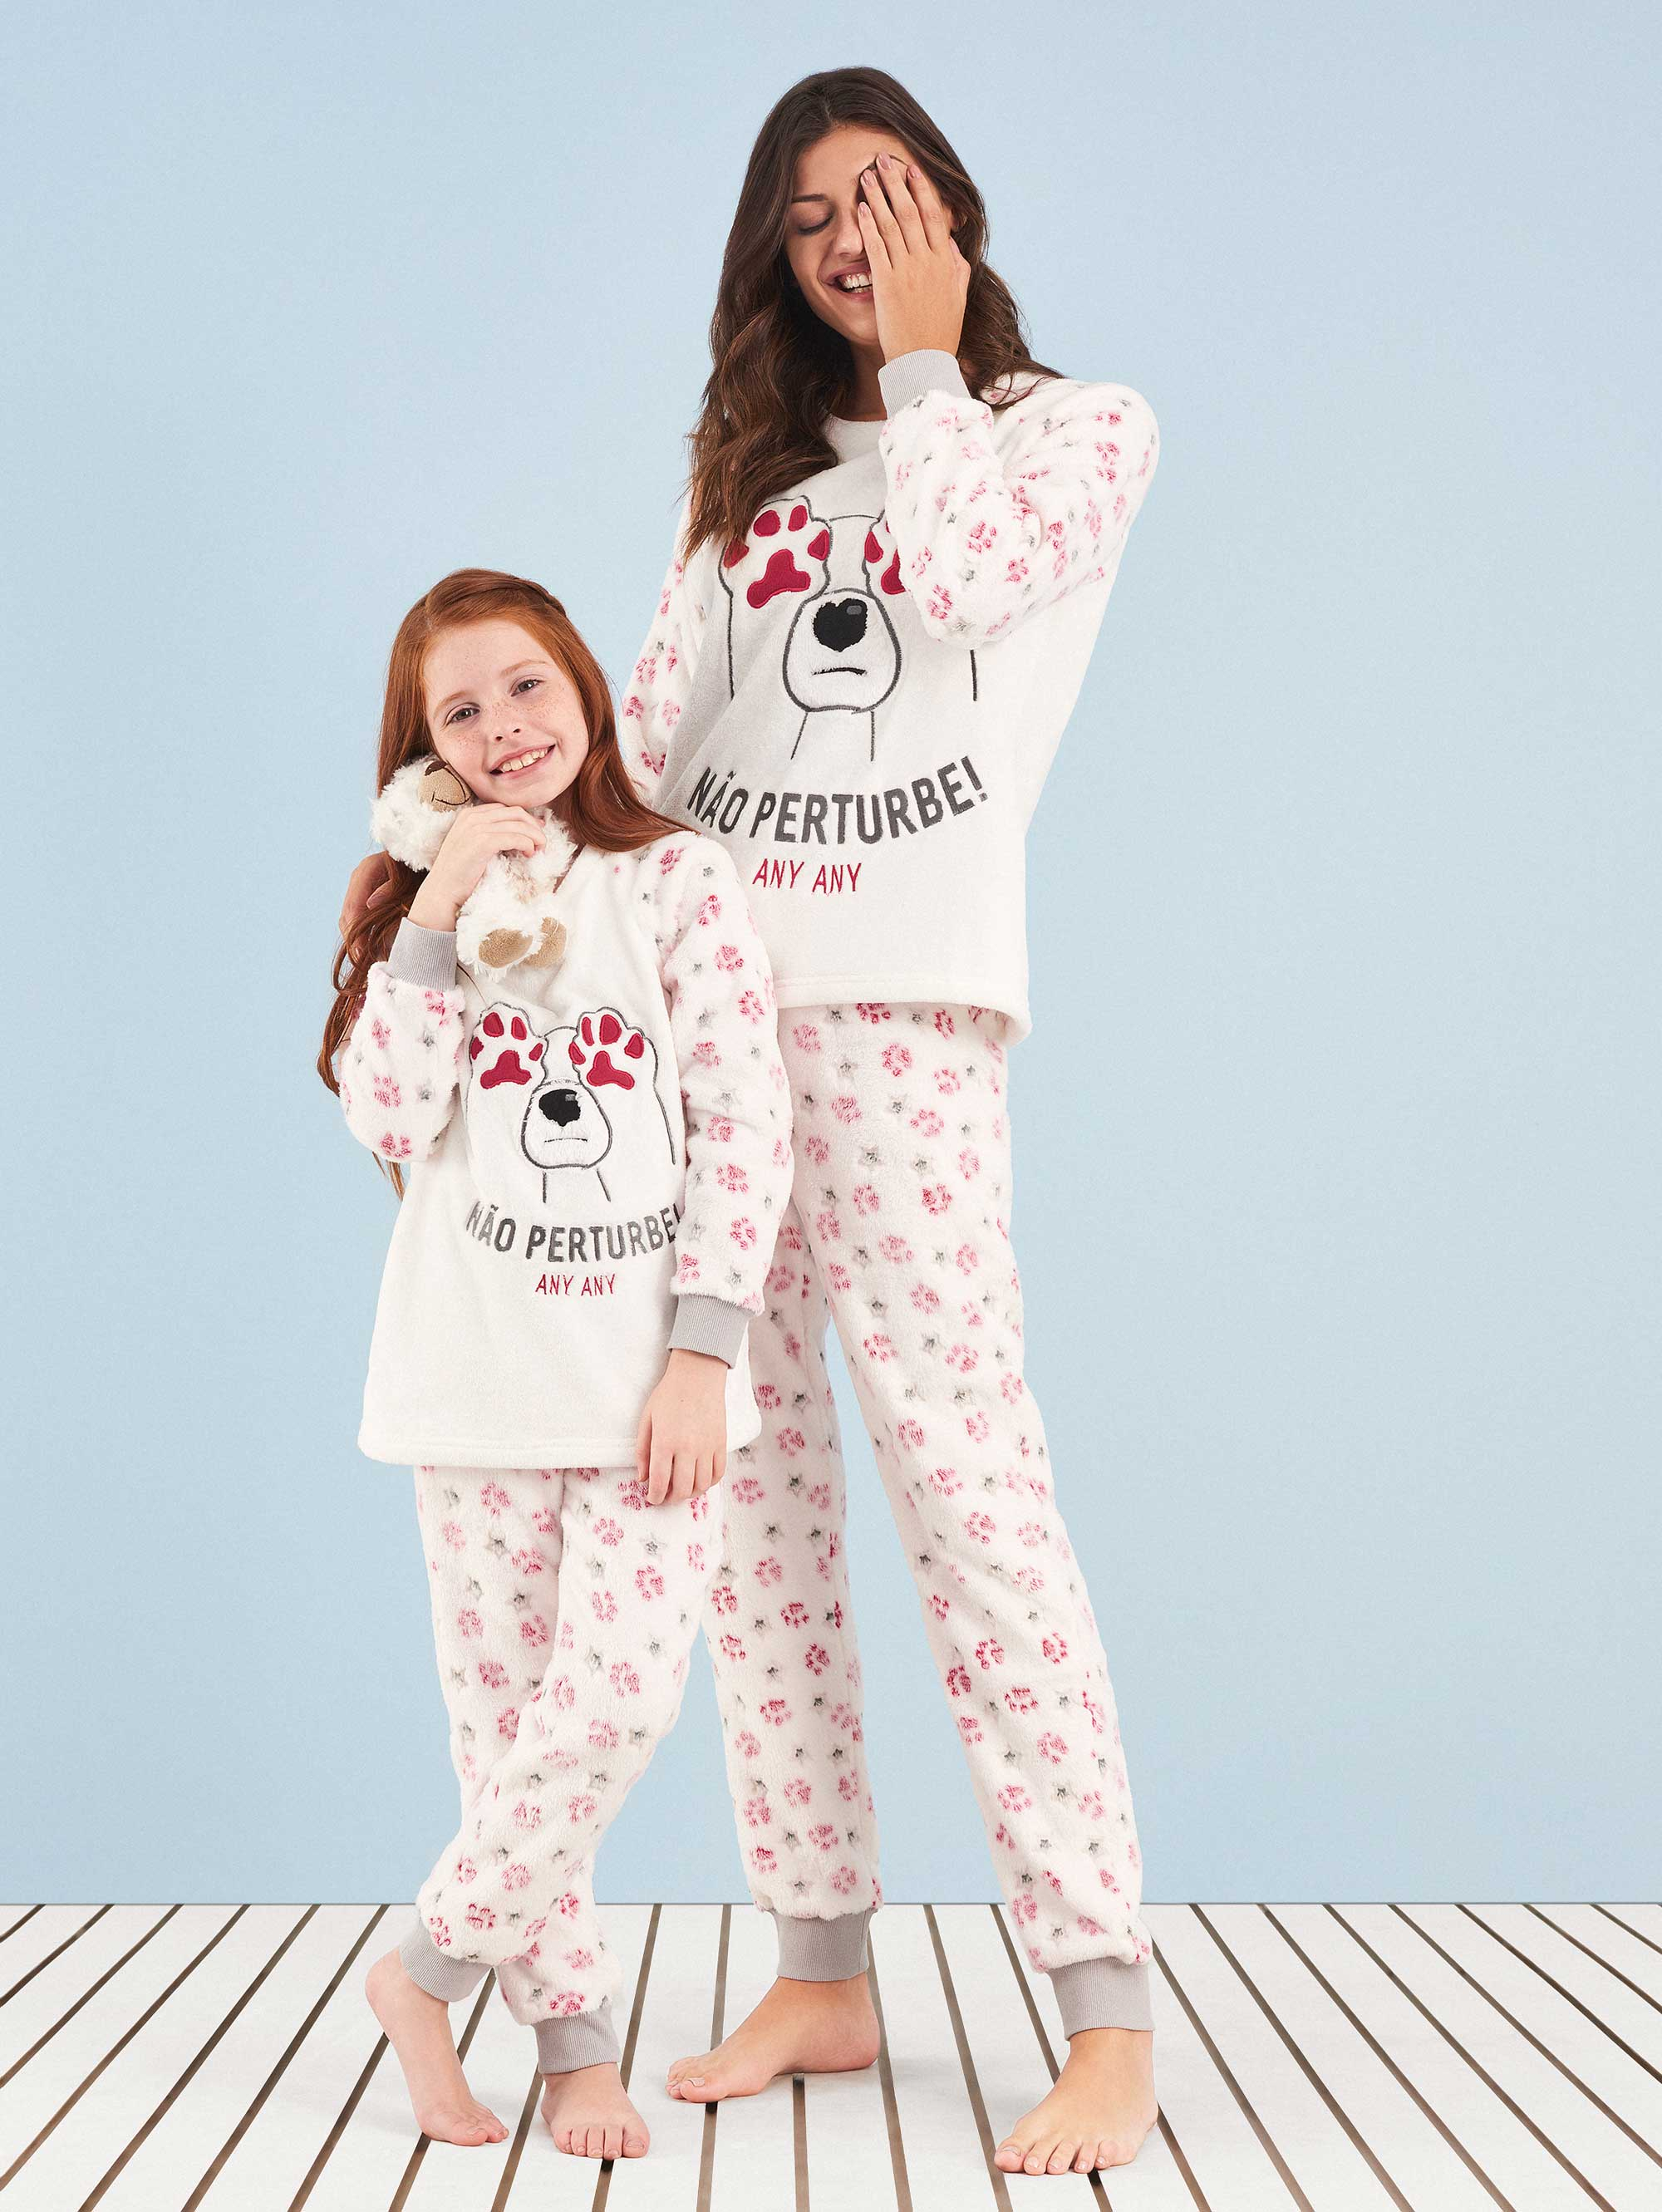 pijama-longo-manga-longa-soft-infantil-urso-nao-perturbe-any-any